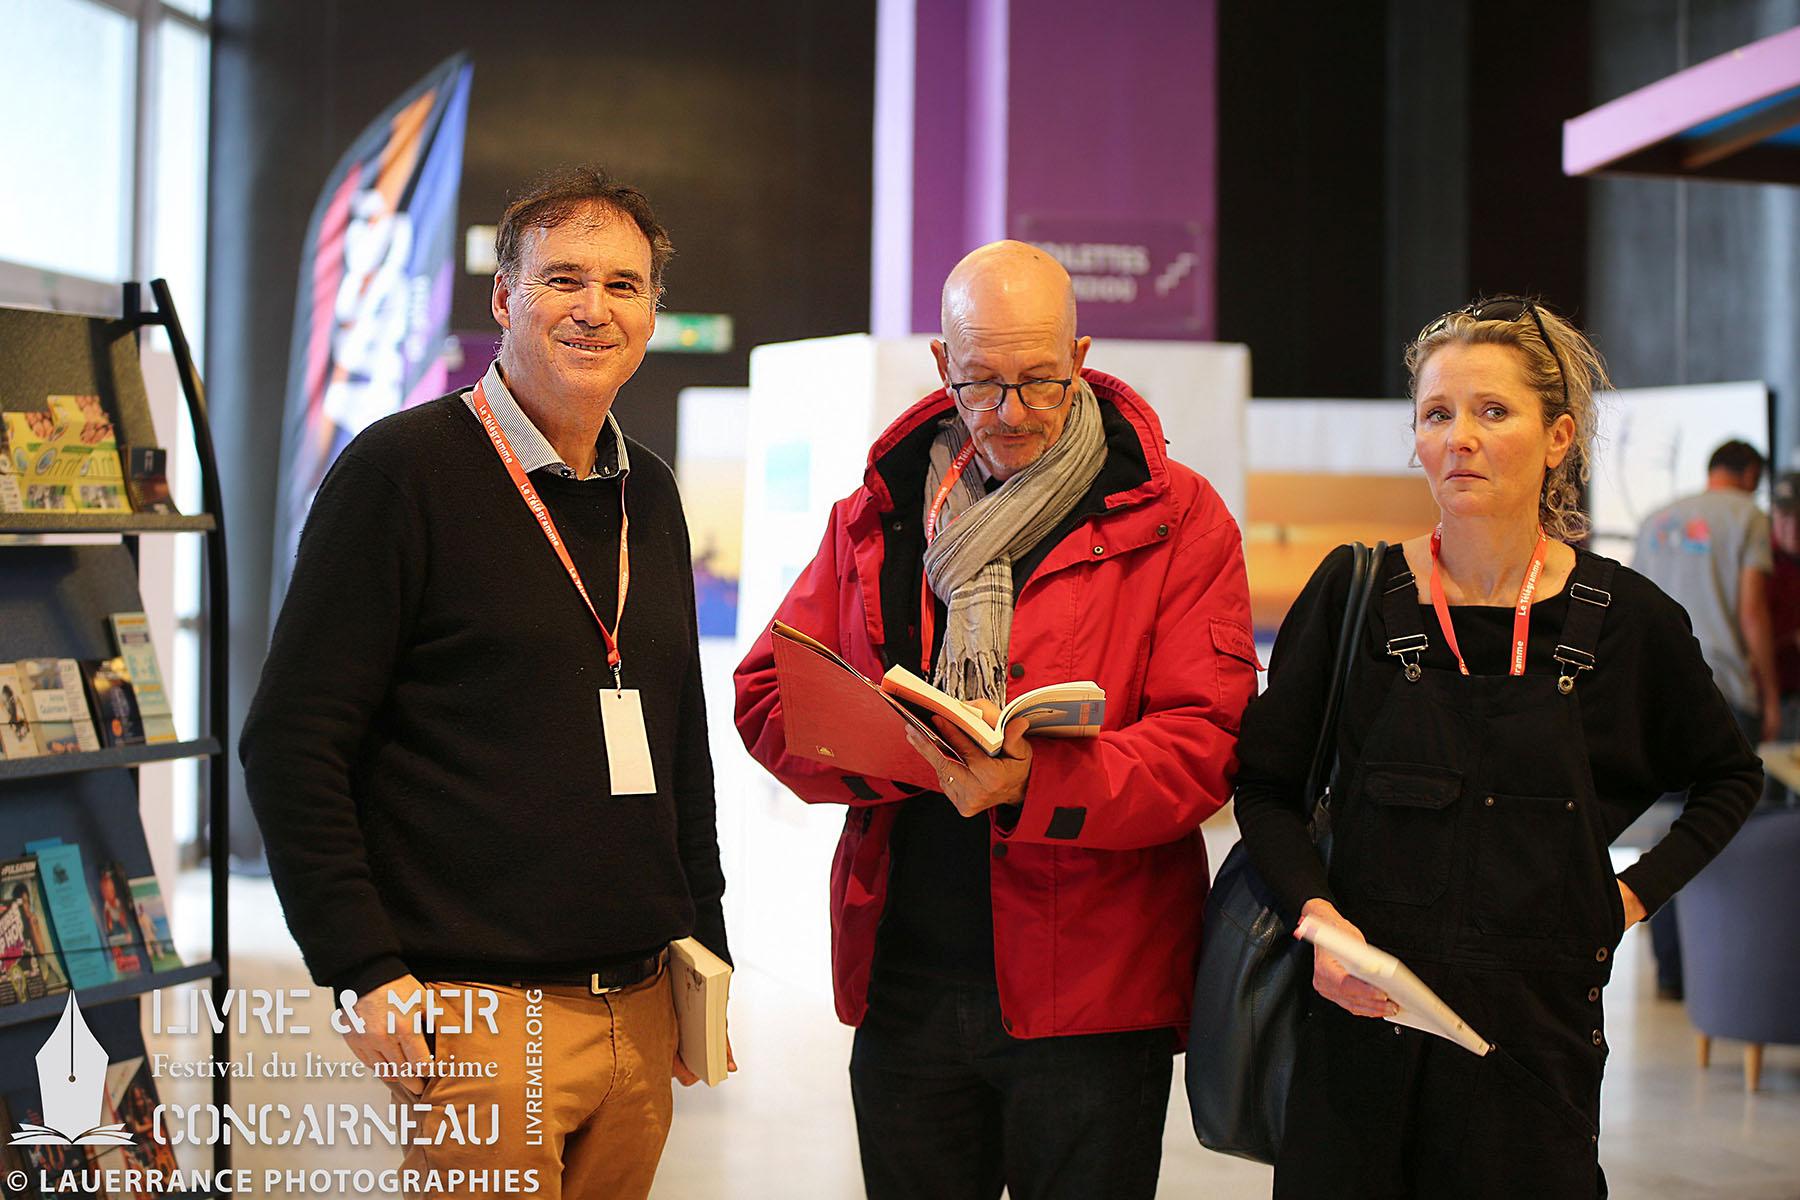 Alain-Gabriel Monot, Gilbert Le Bras & Martine White © Lauerrance Photographies